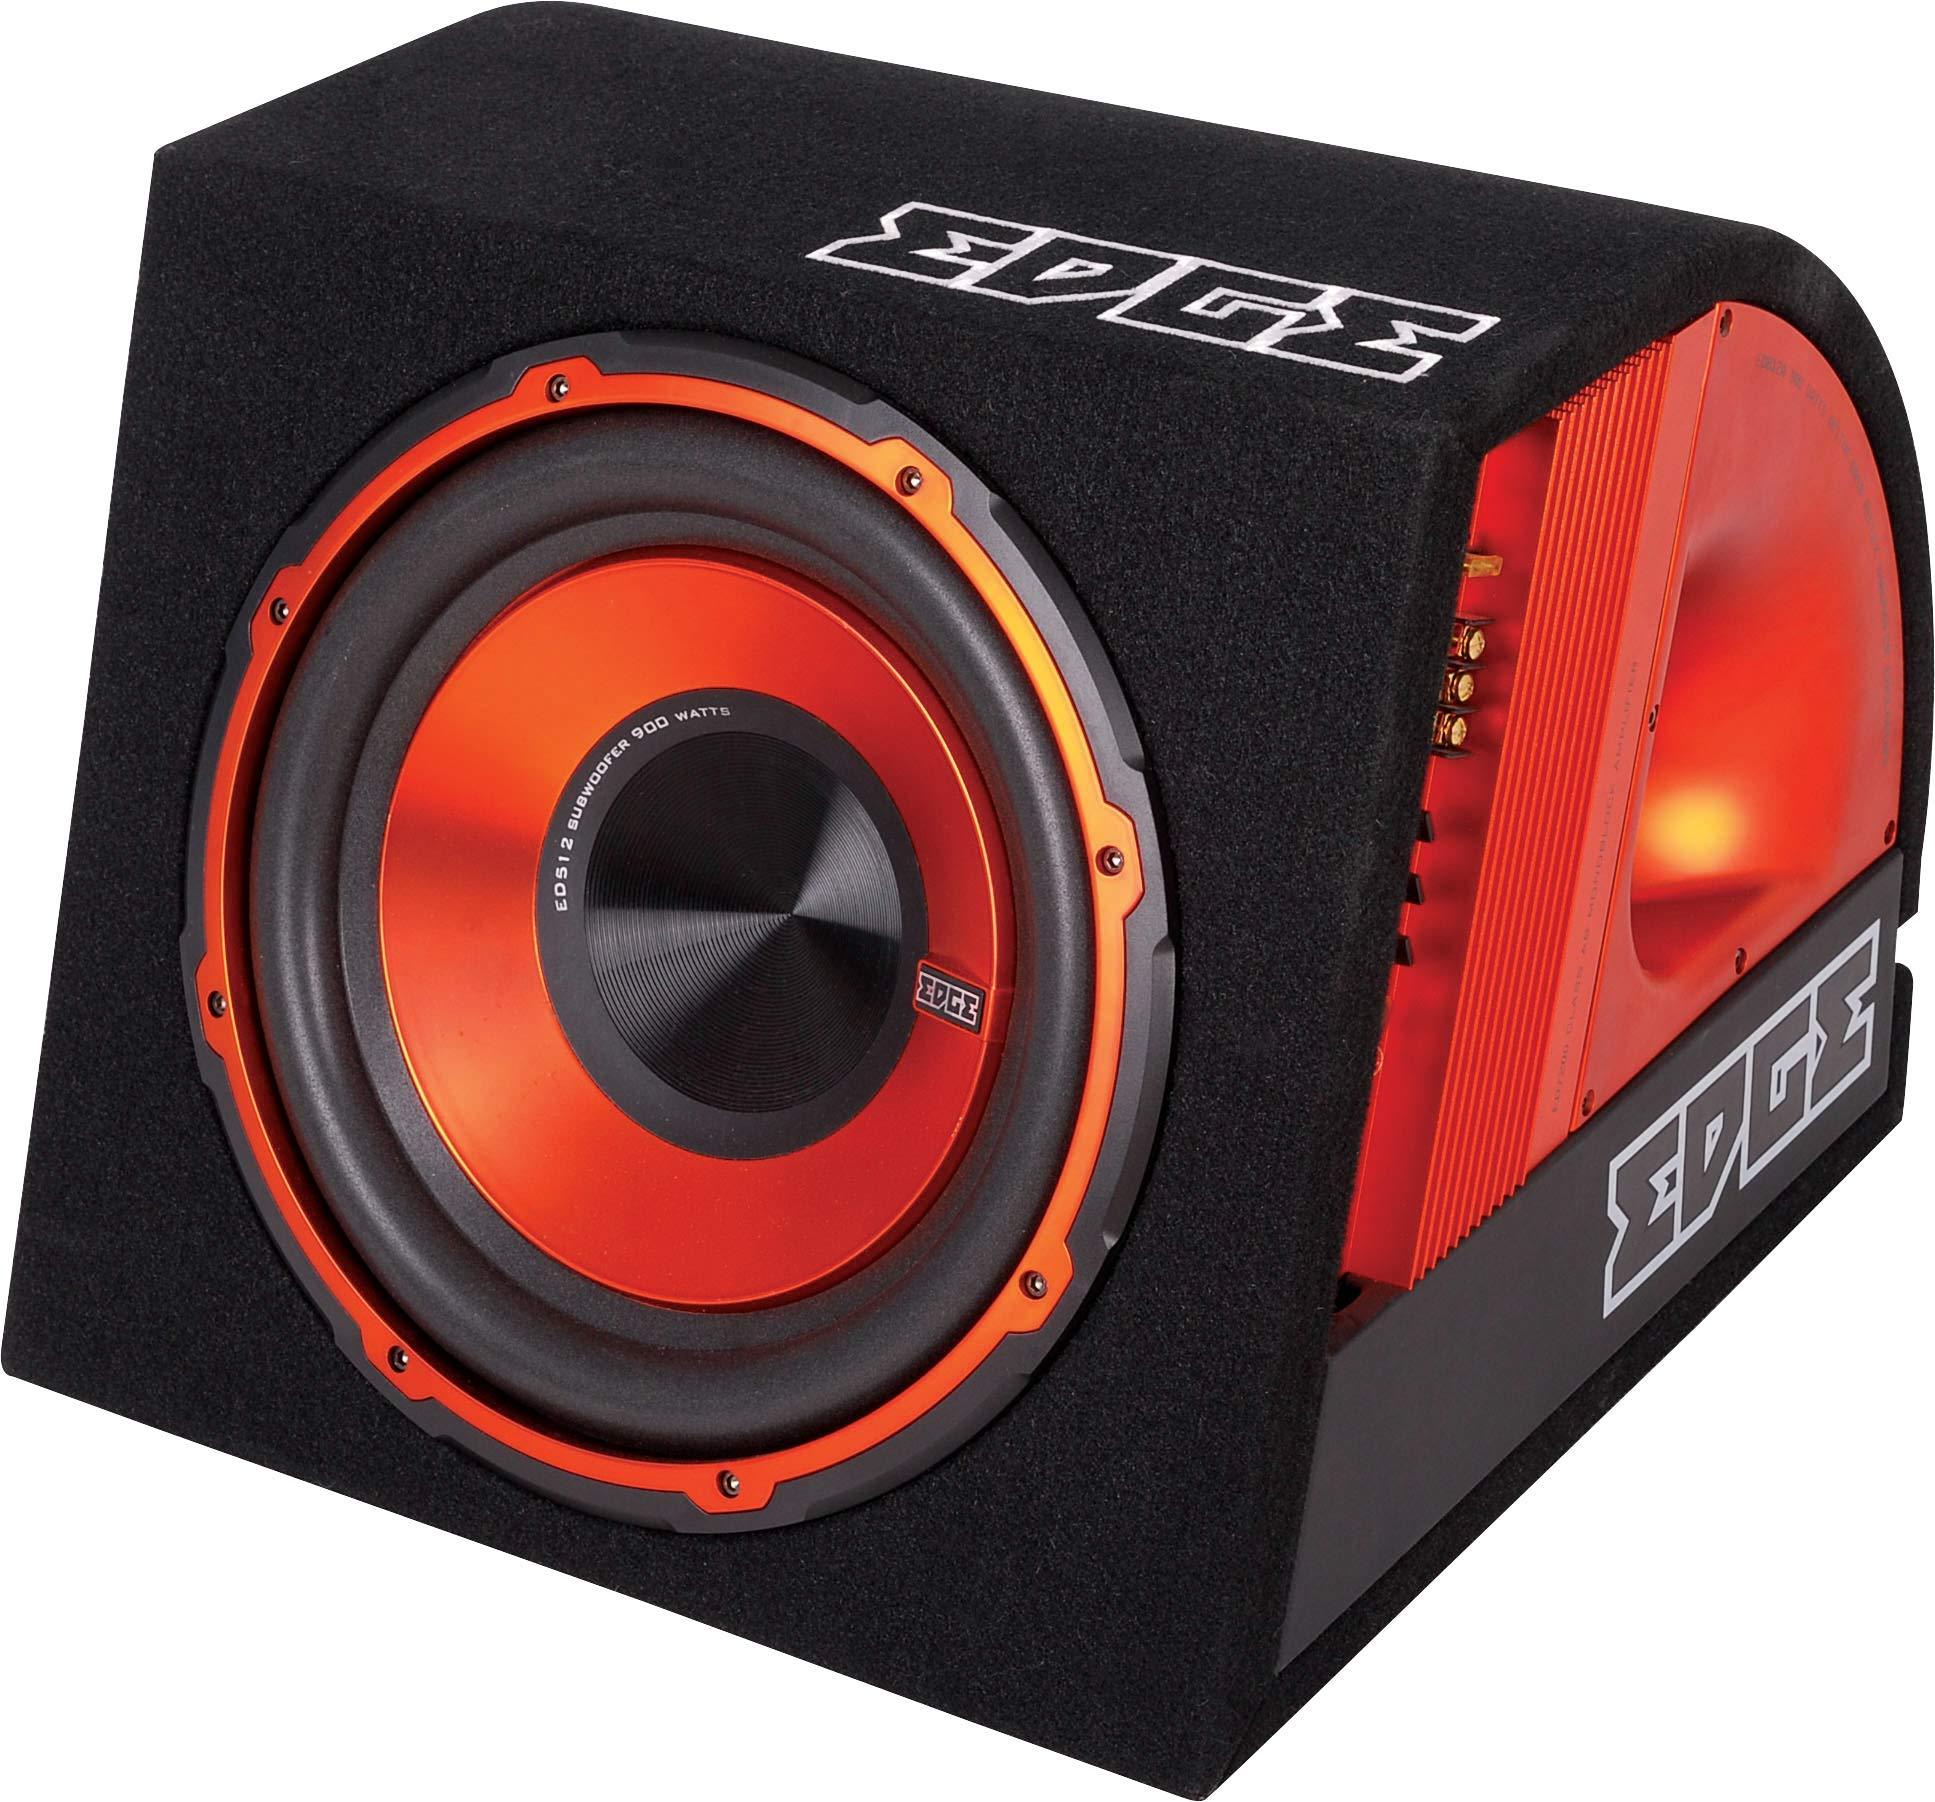 VIBE Audio Edge V2 12 Inch Active Subwoofer Enclosure